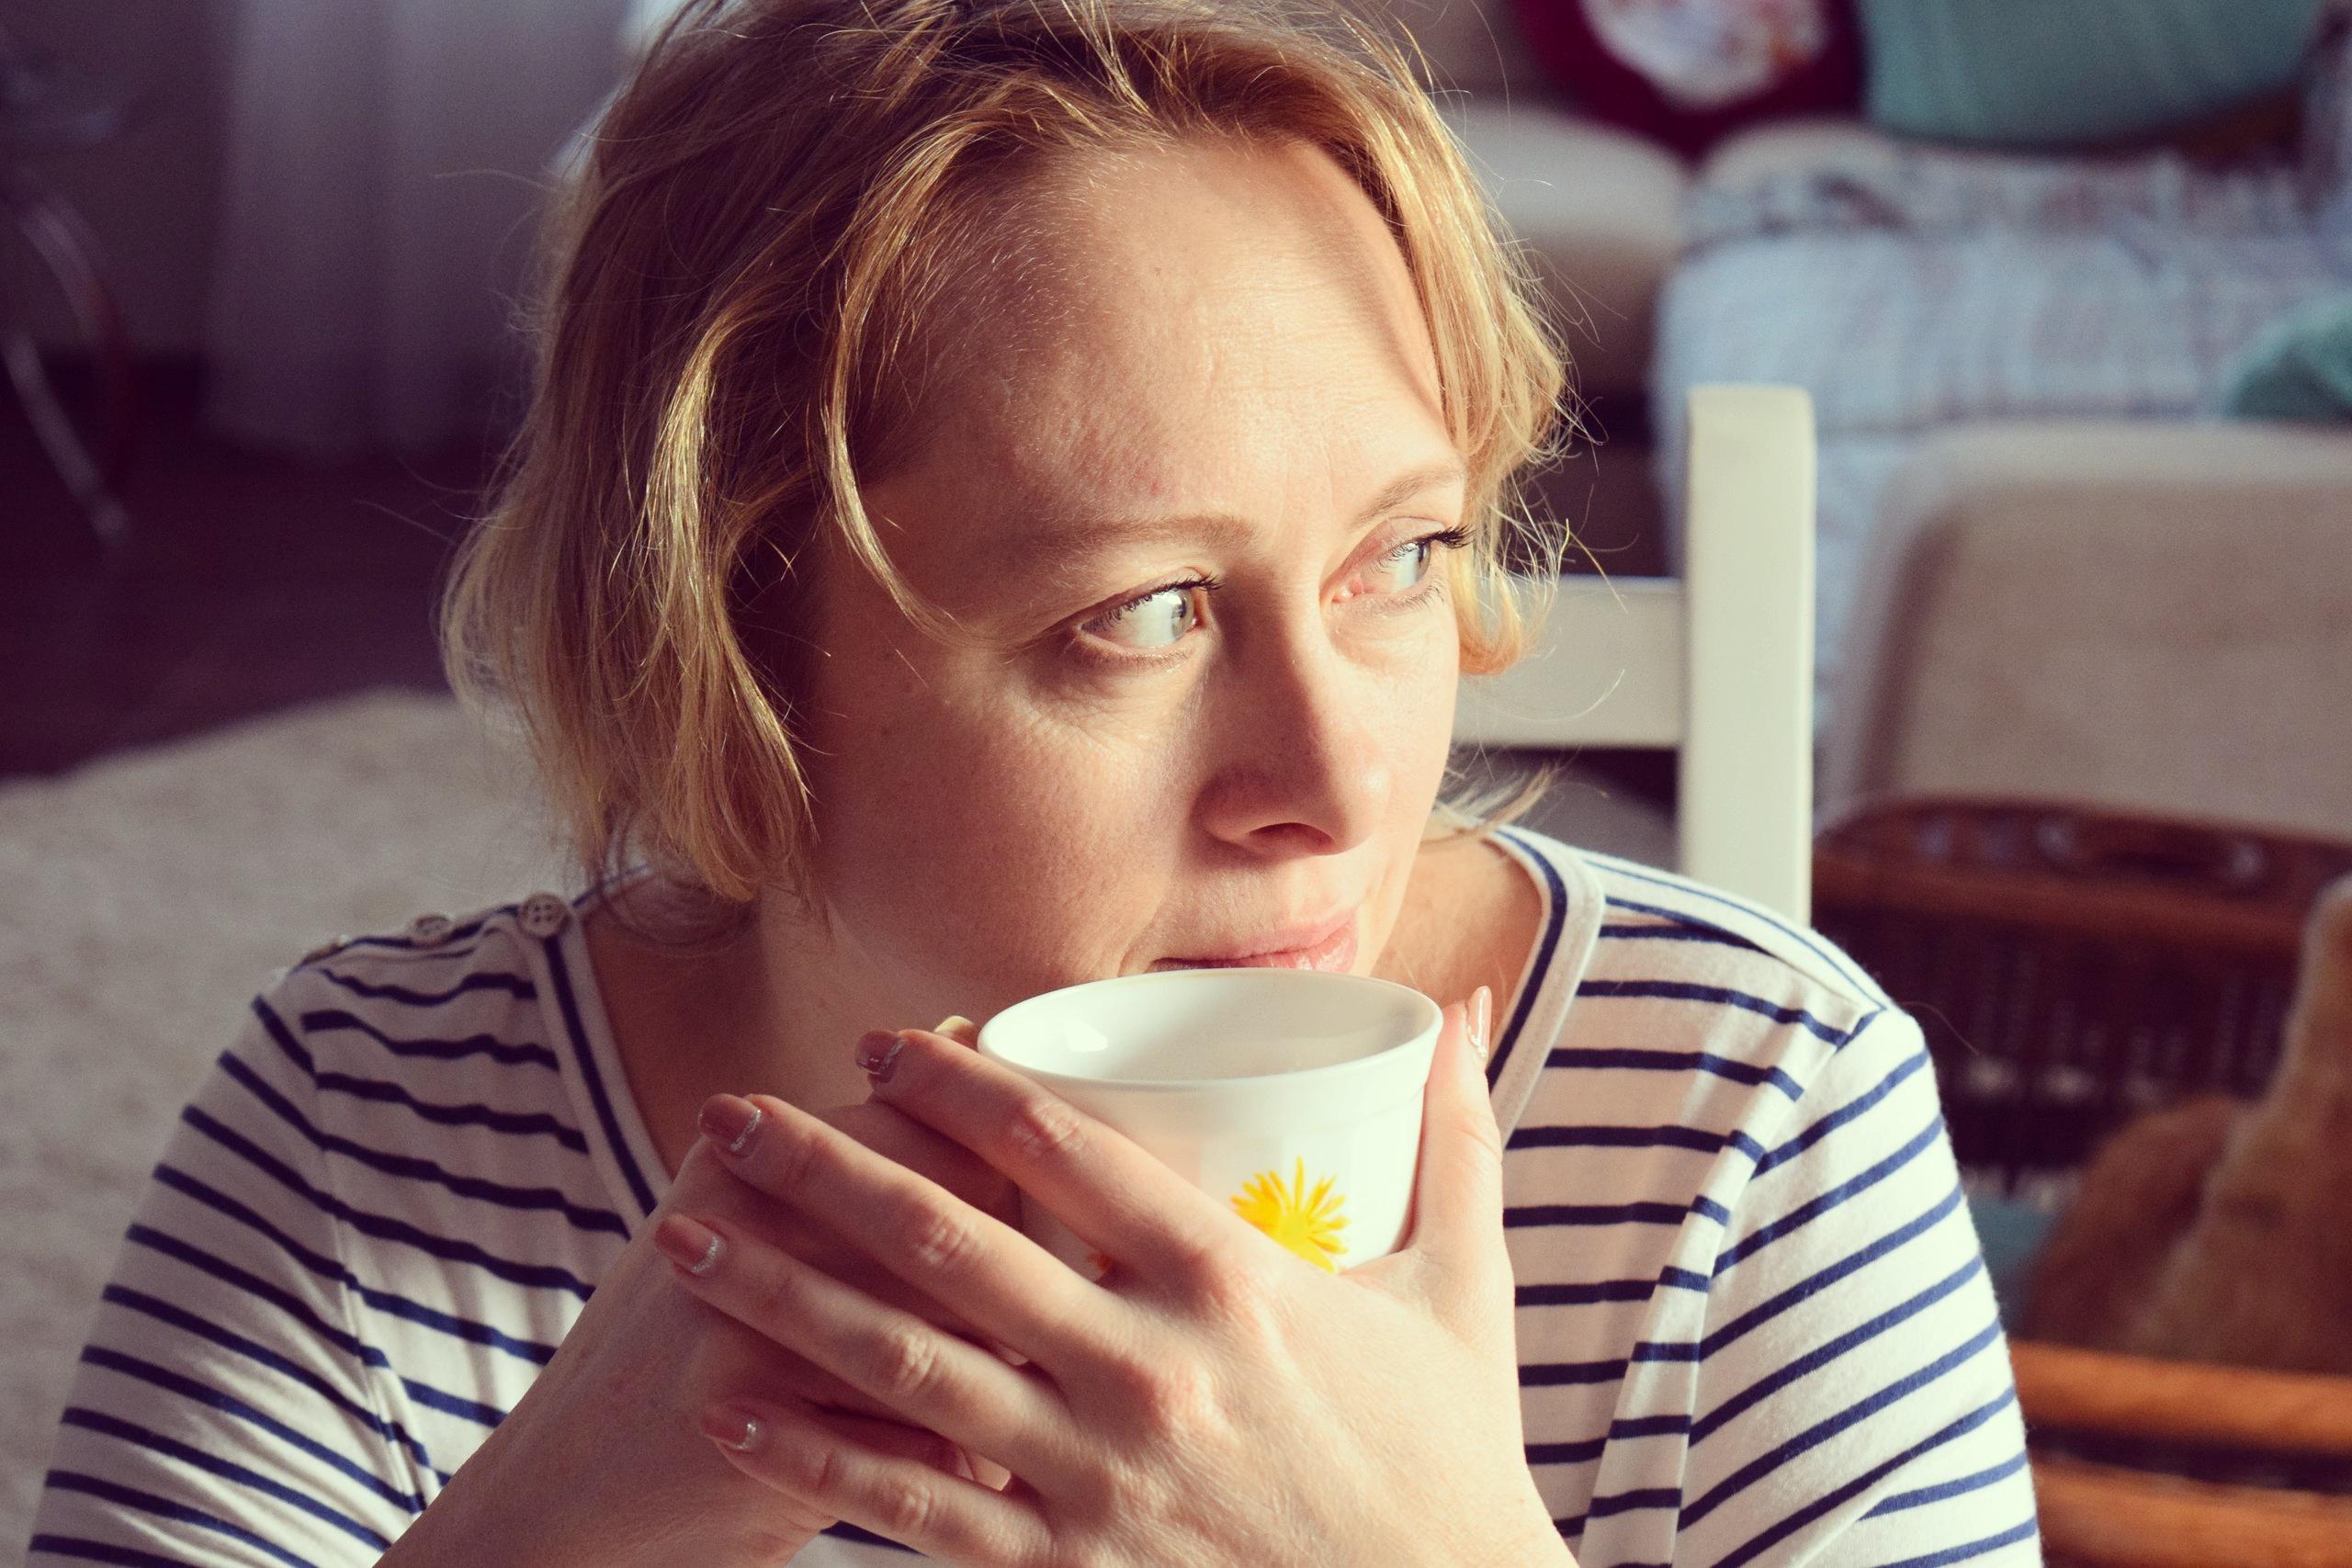 Утро с мамой за чашкой чая.. За чашкой чая